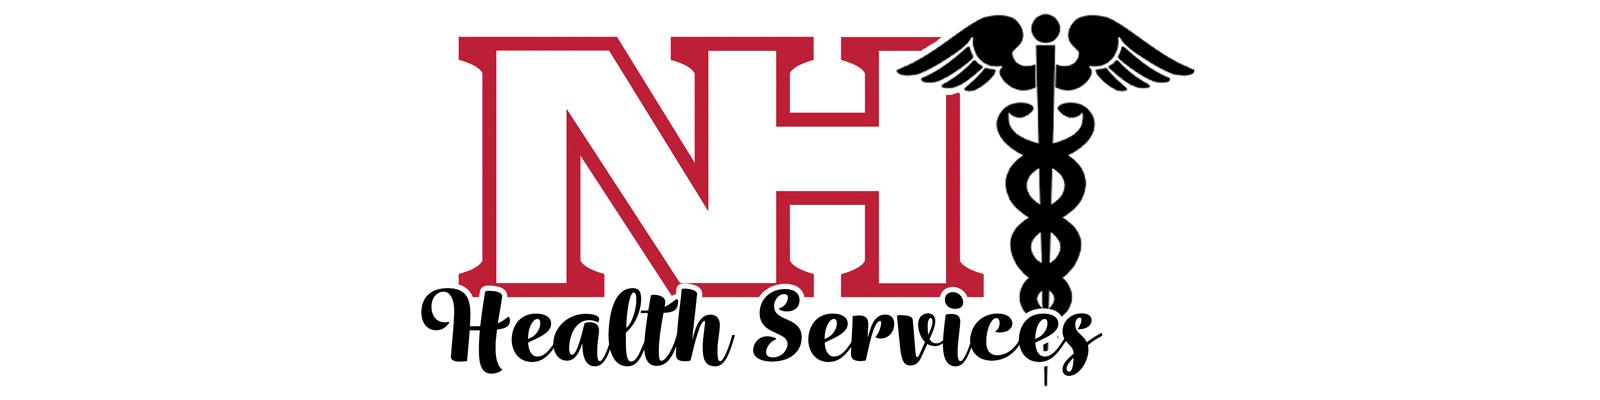 NH-HealthServicesFormHeader3.jpg